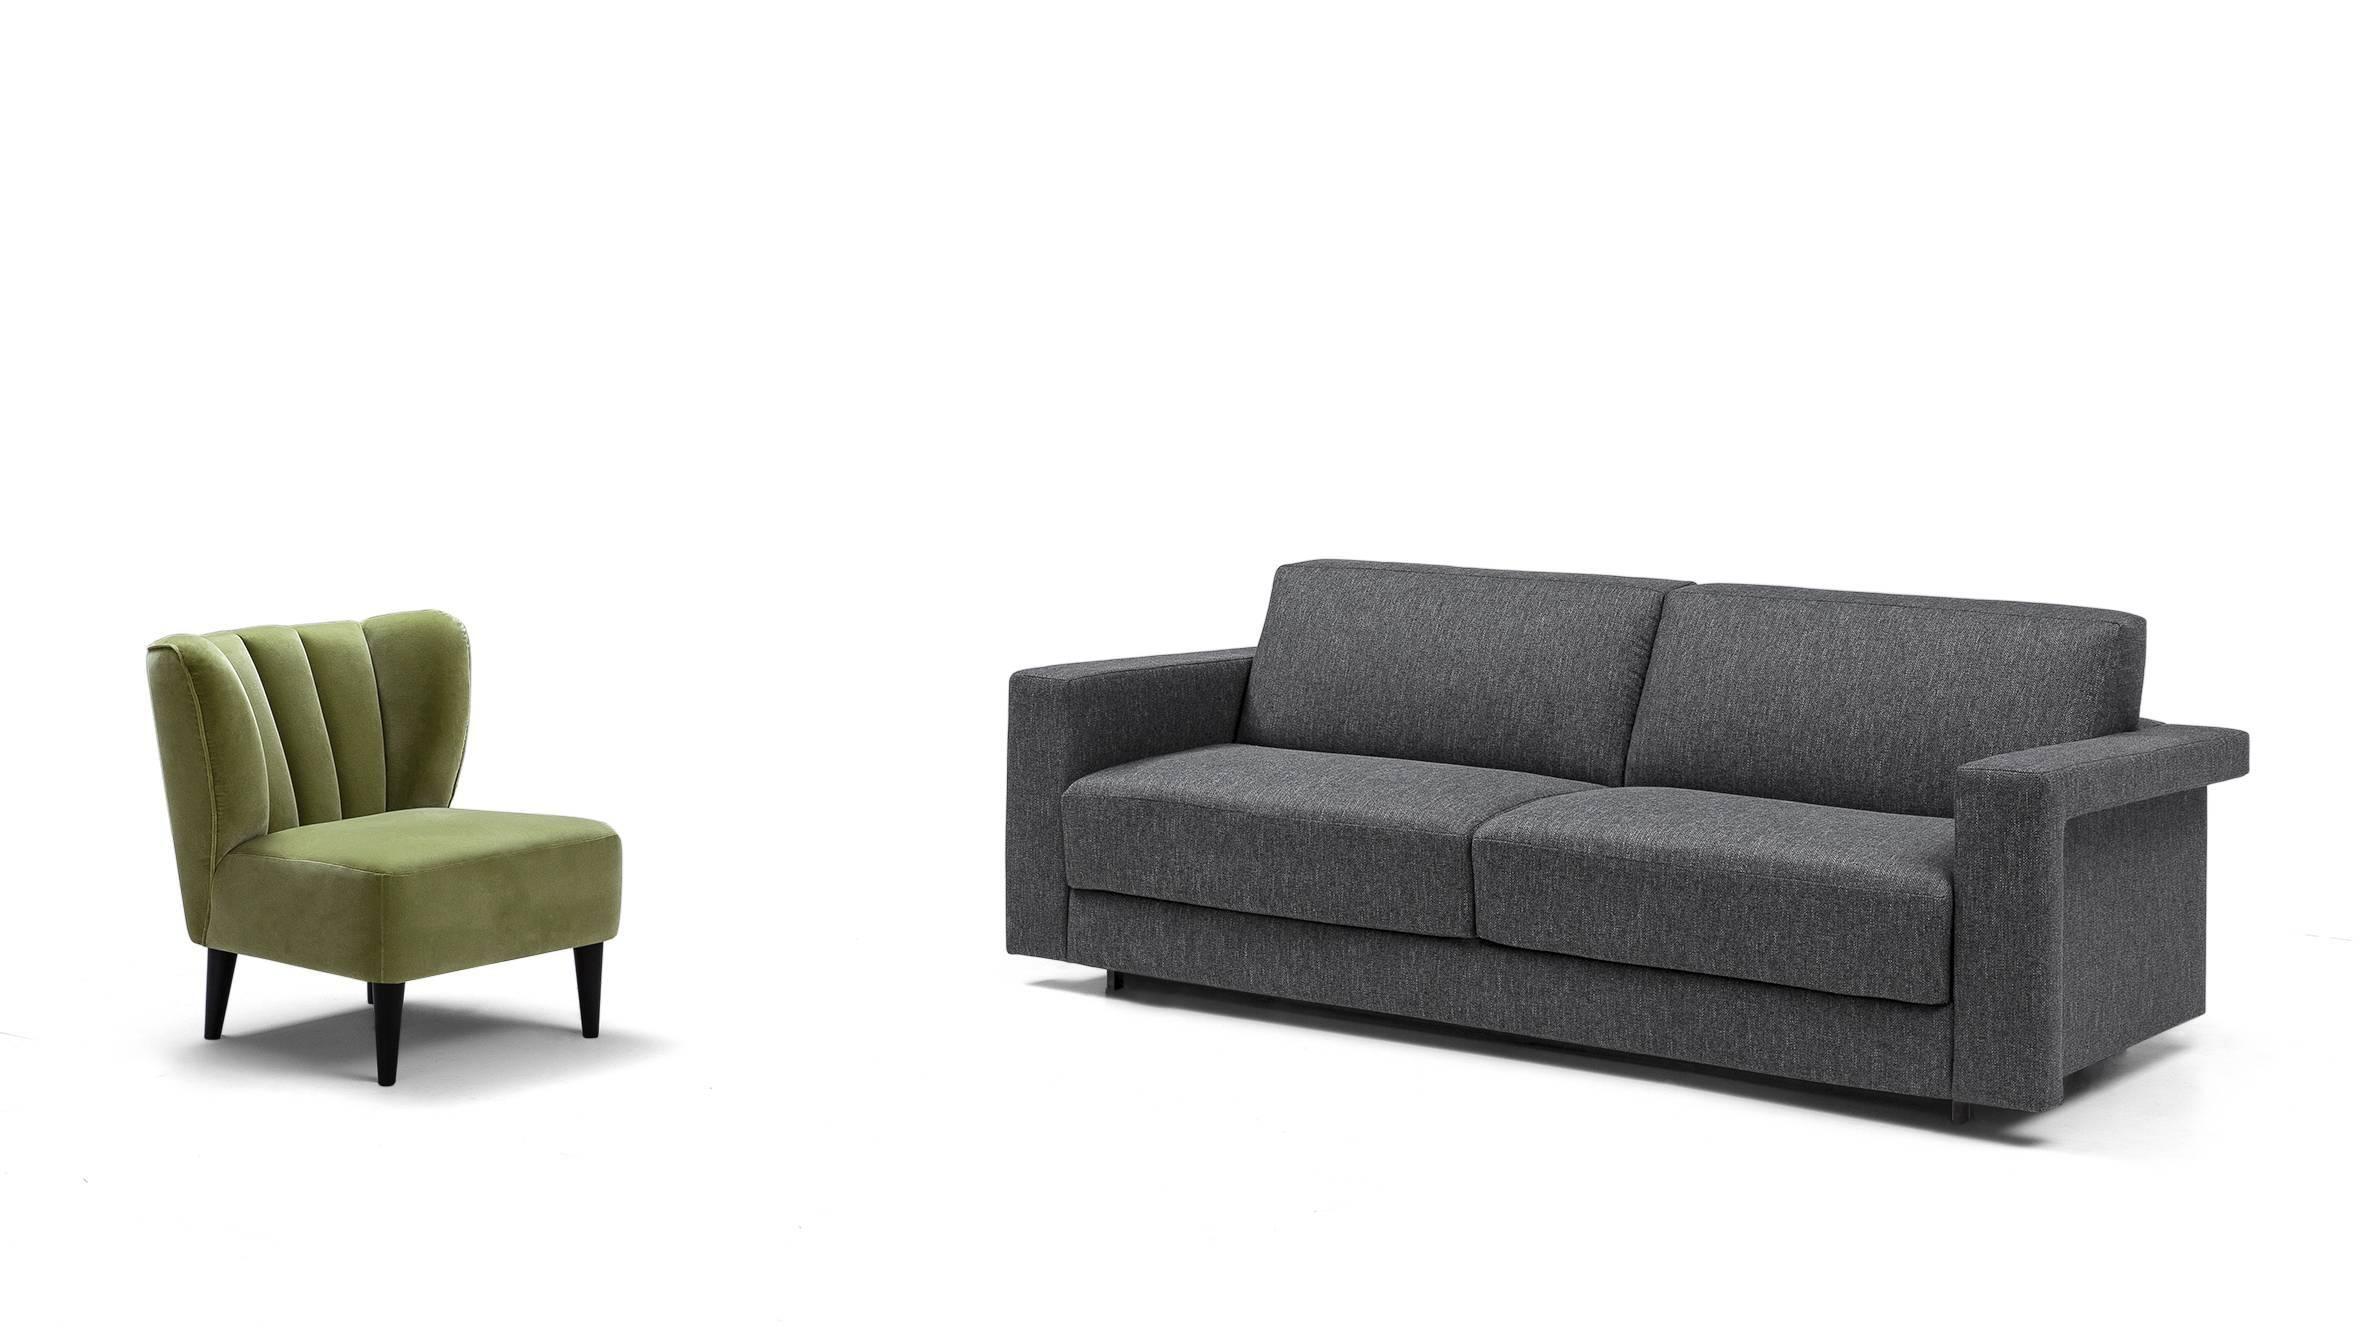 Contemporary Sofa Beds Contemporary Sofa Bed Modern Sofa Bed Sofa